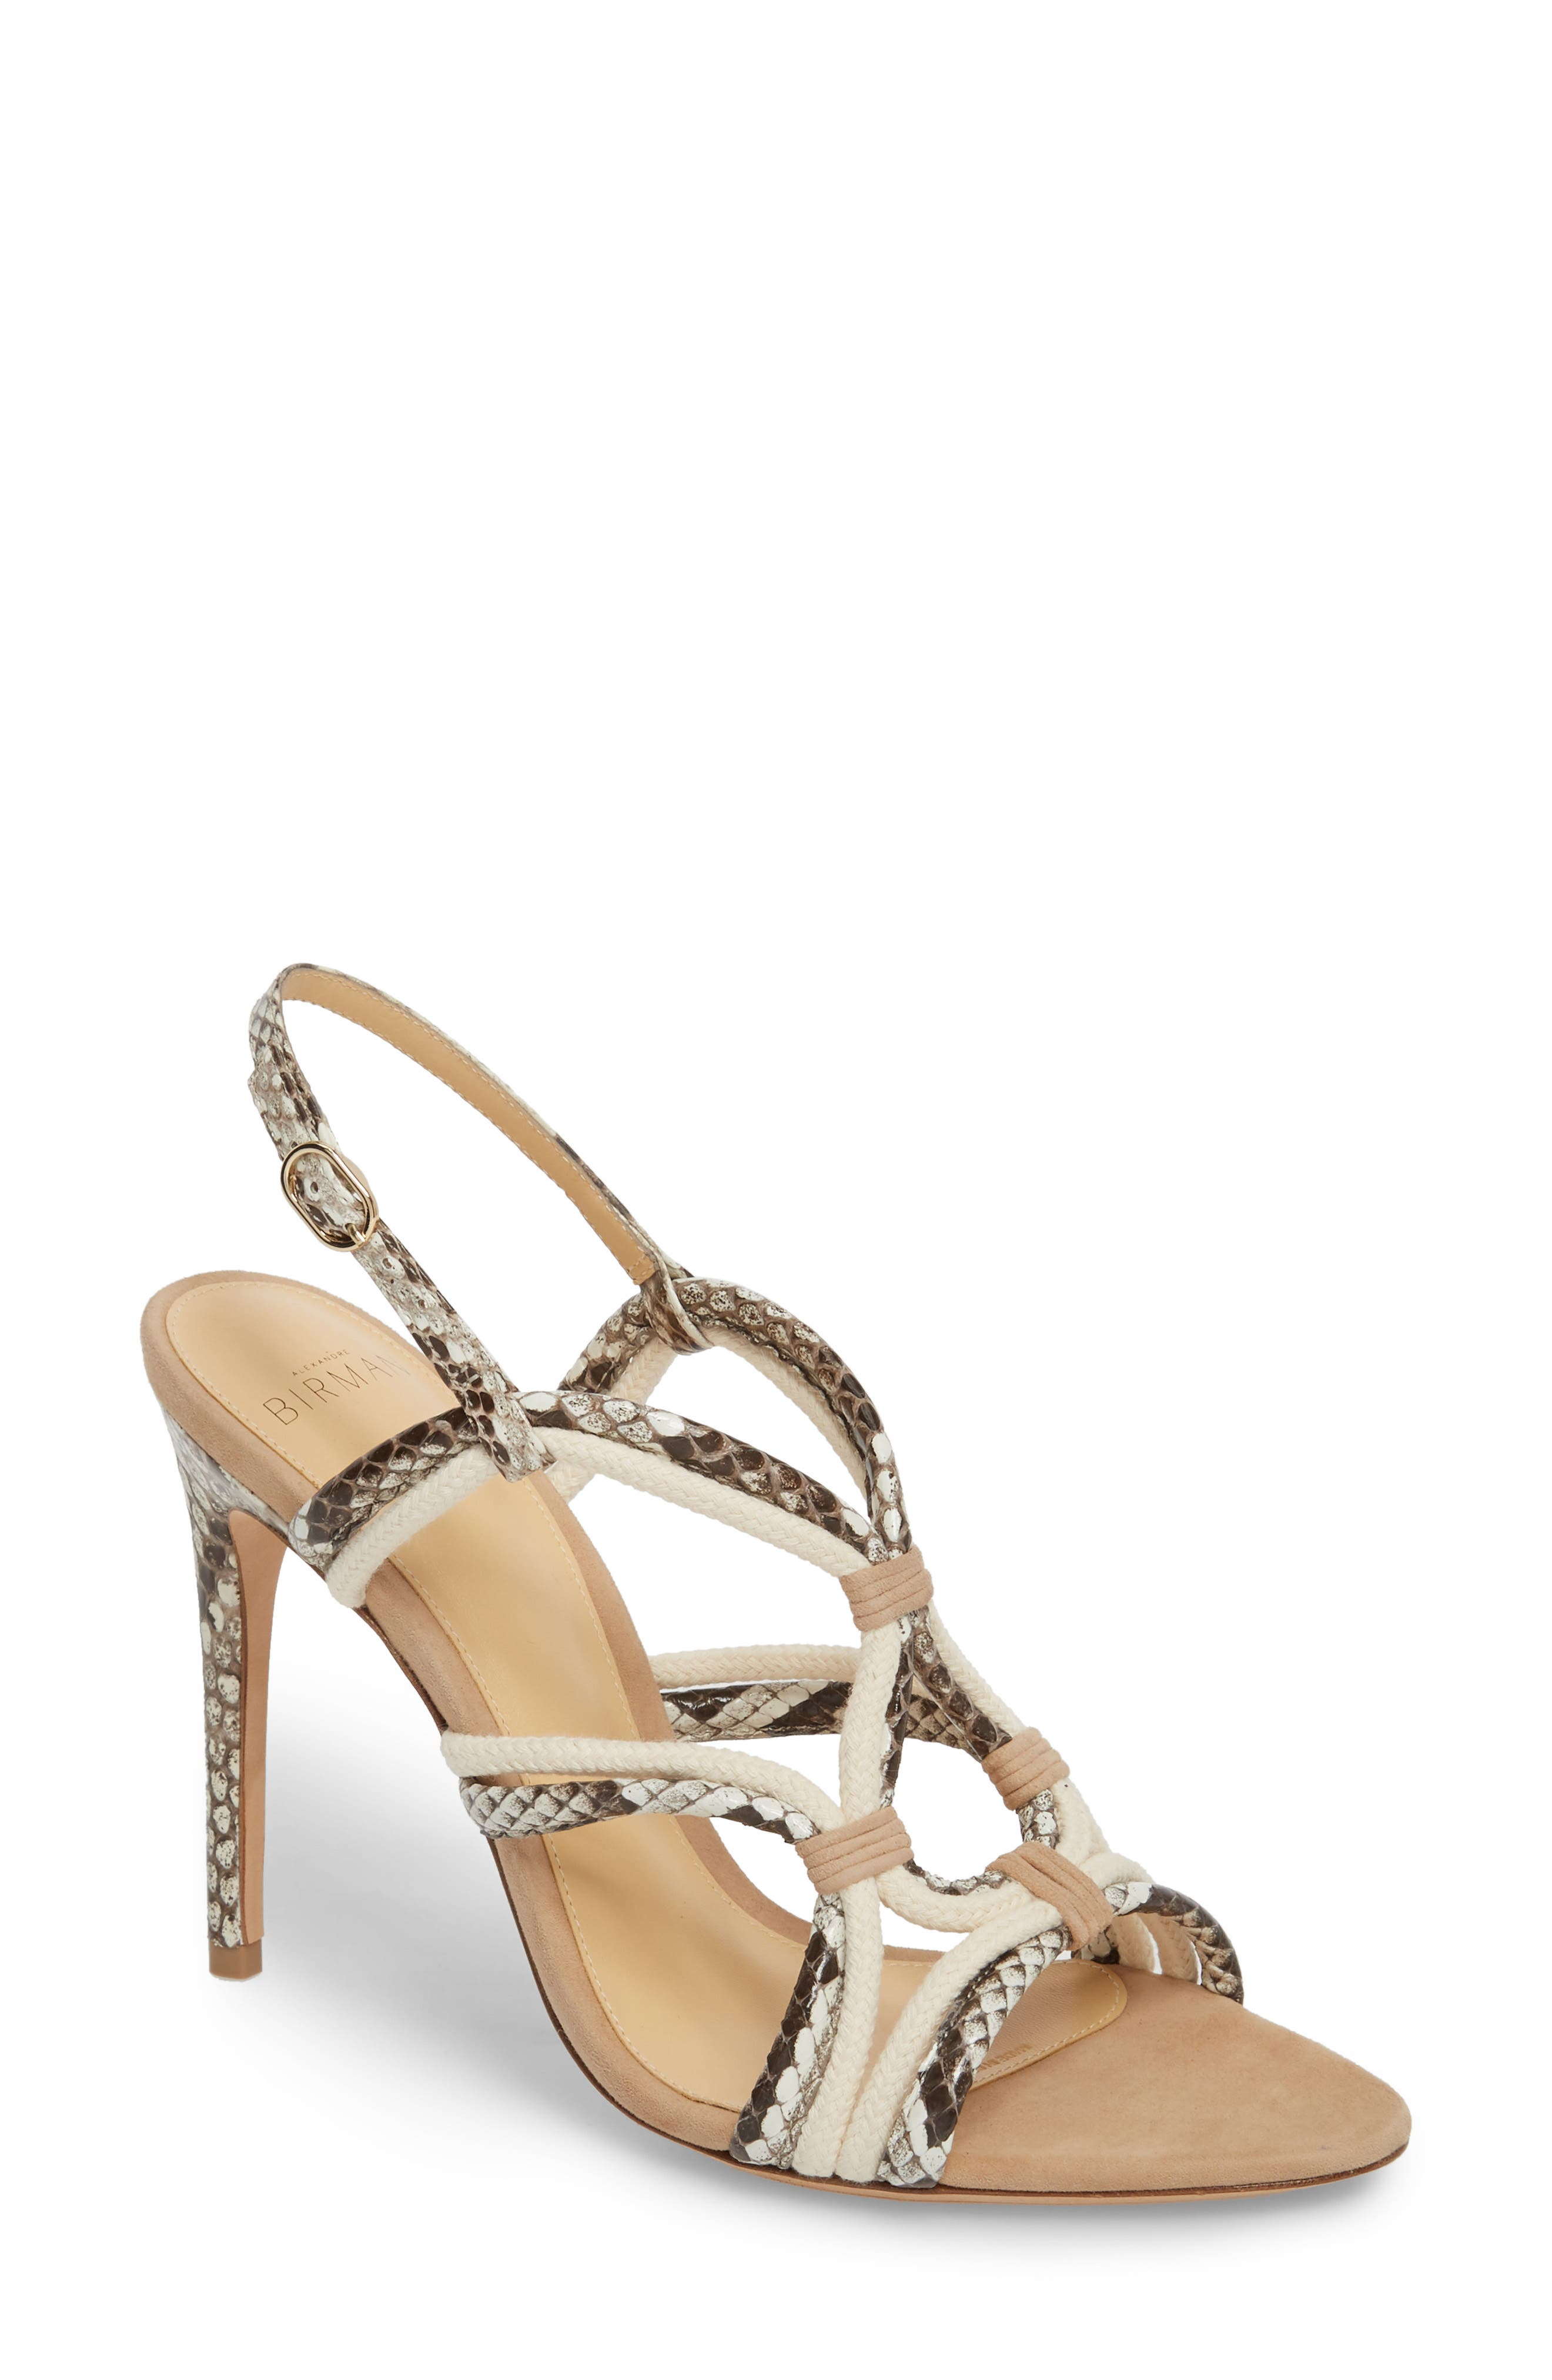 ALEXANDRE BIRMAN Giovanna Genuine Python Sandal, Main, color, 250